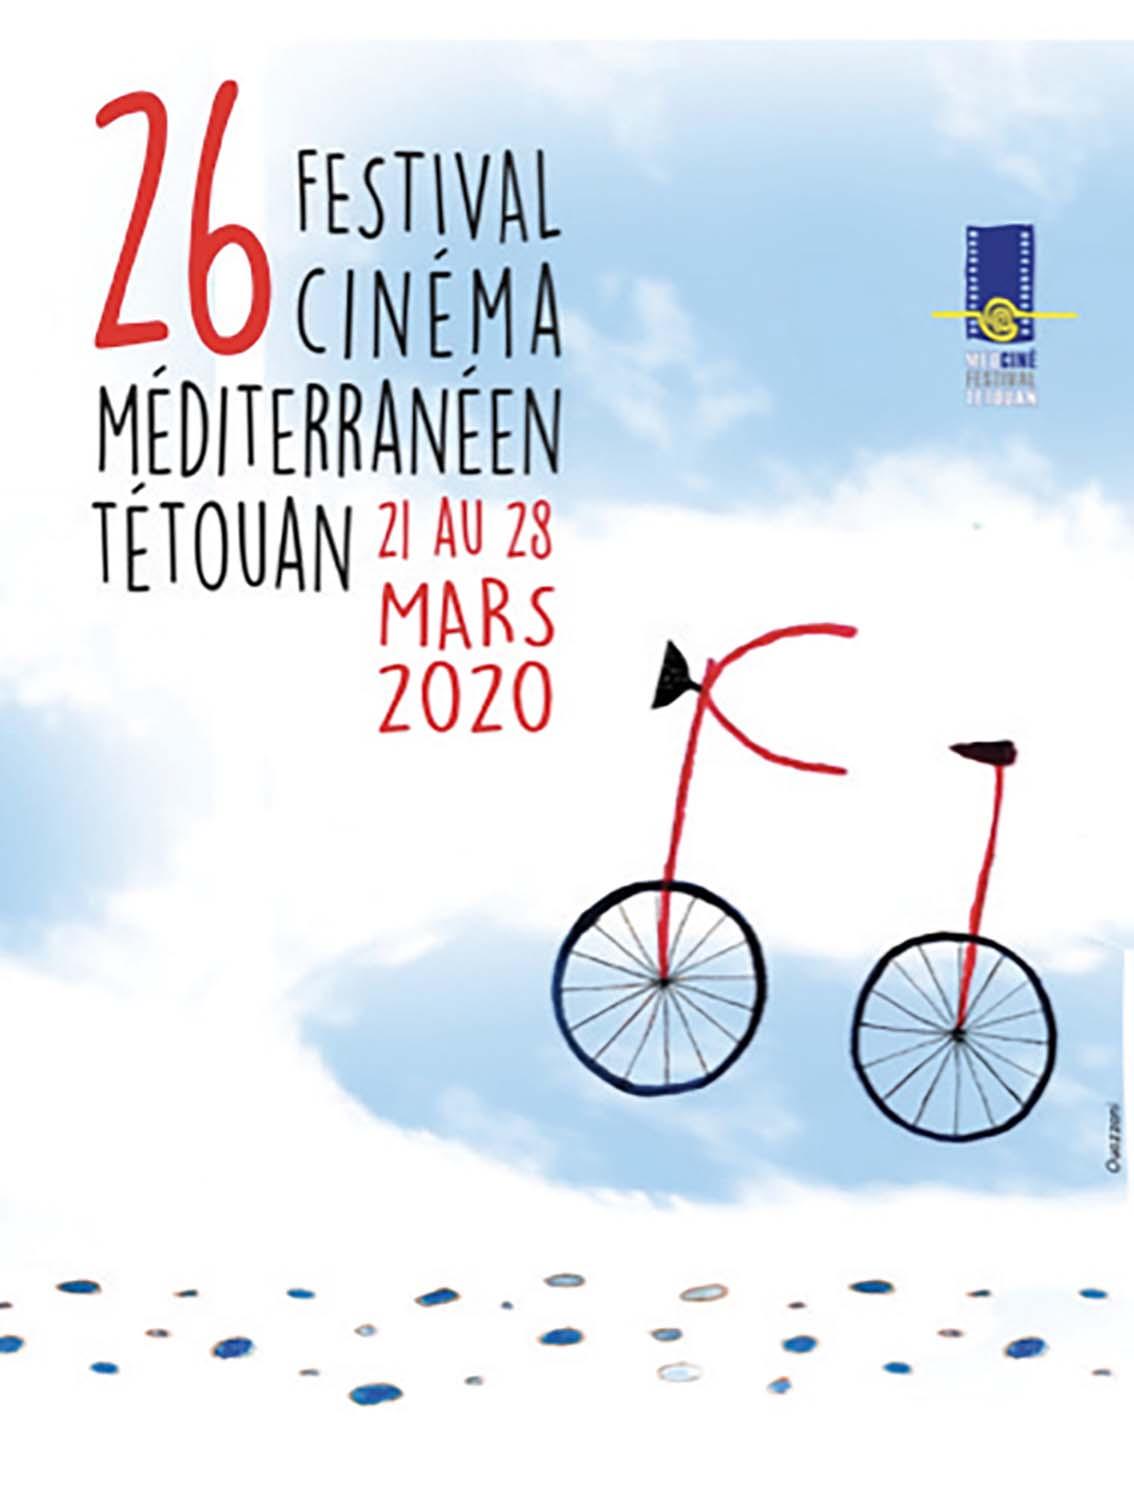 Cinéma Festival International du Cinéma Méditerranéen de Tétouan